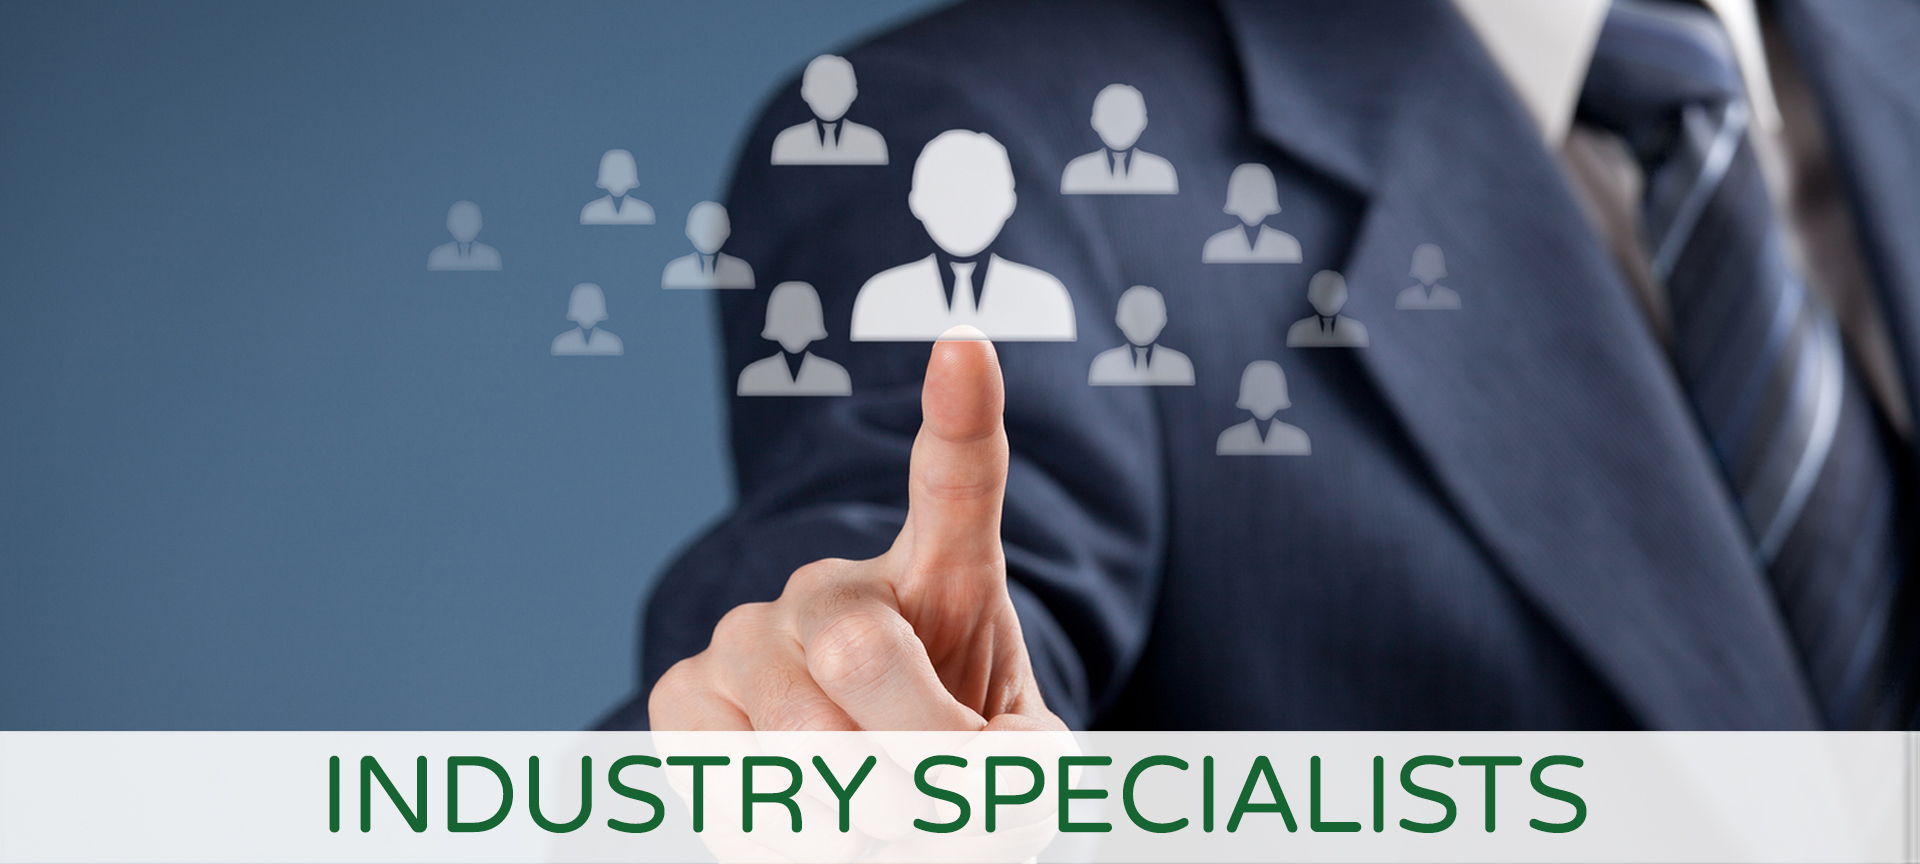 industryspecialists.jpg